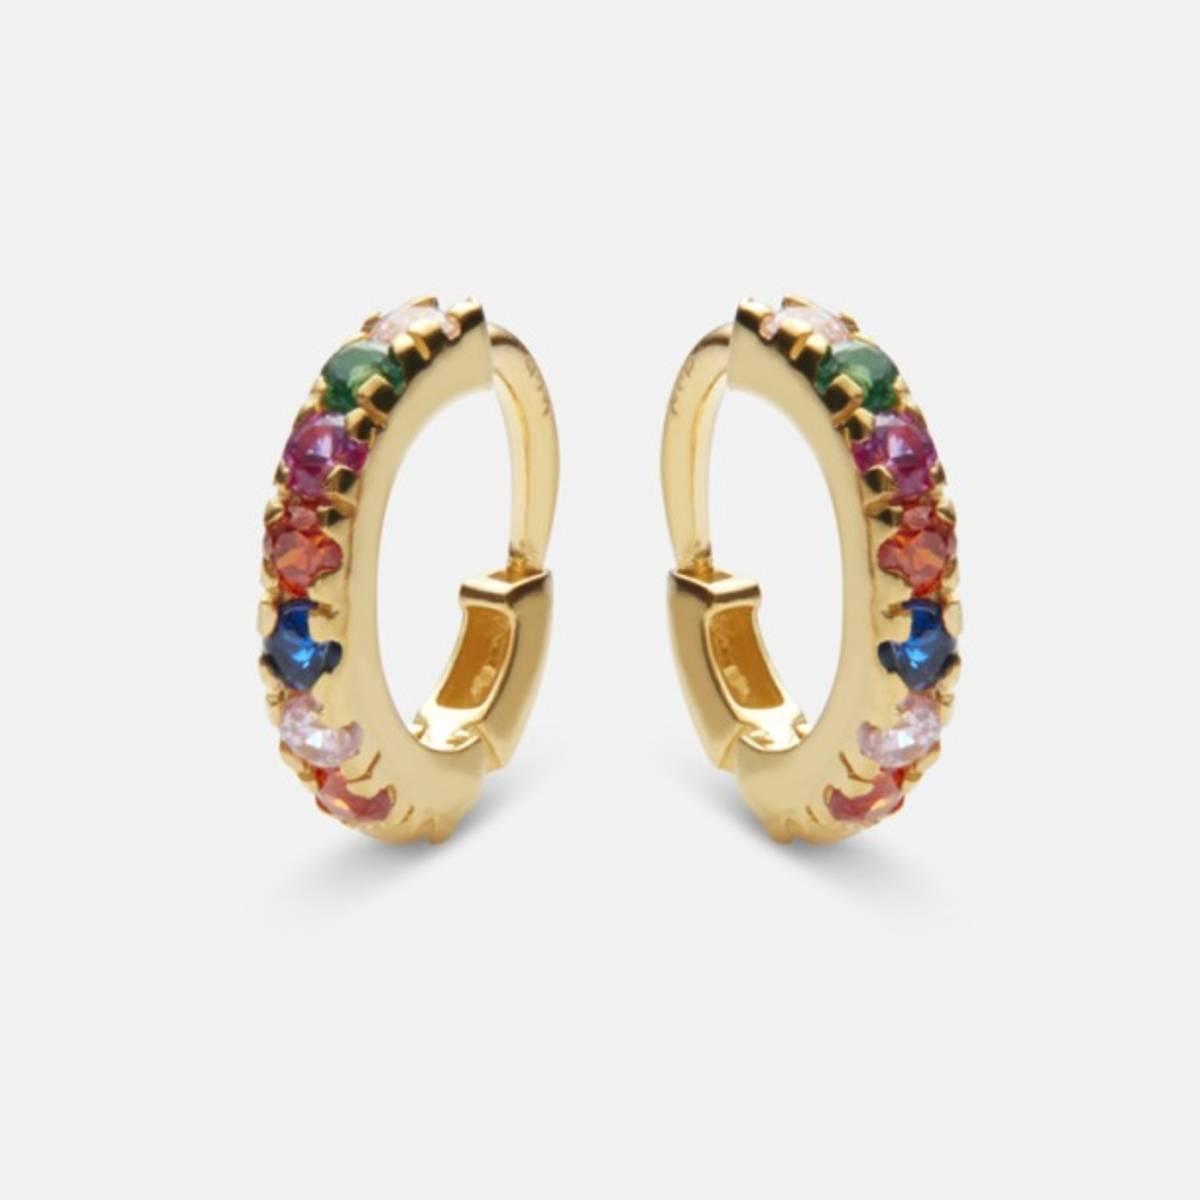 MAANESTEN Nubia Color Earring Gold